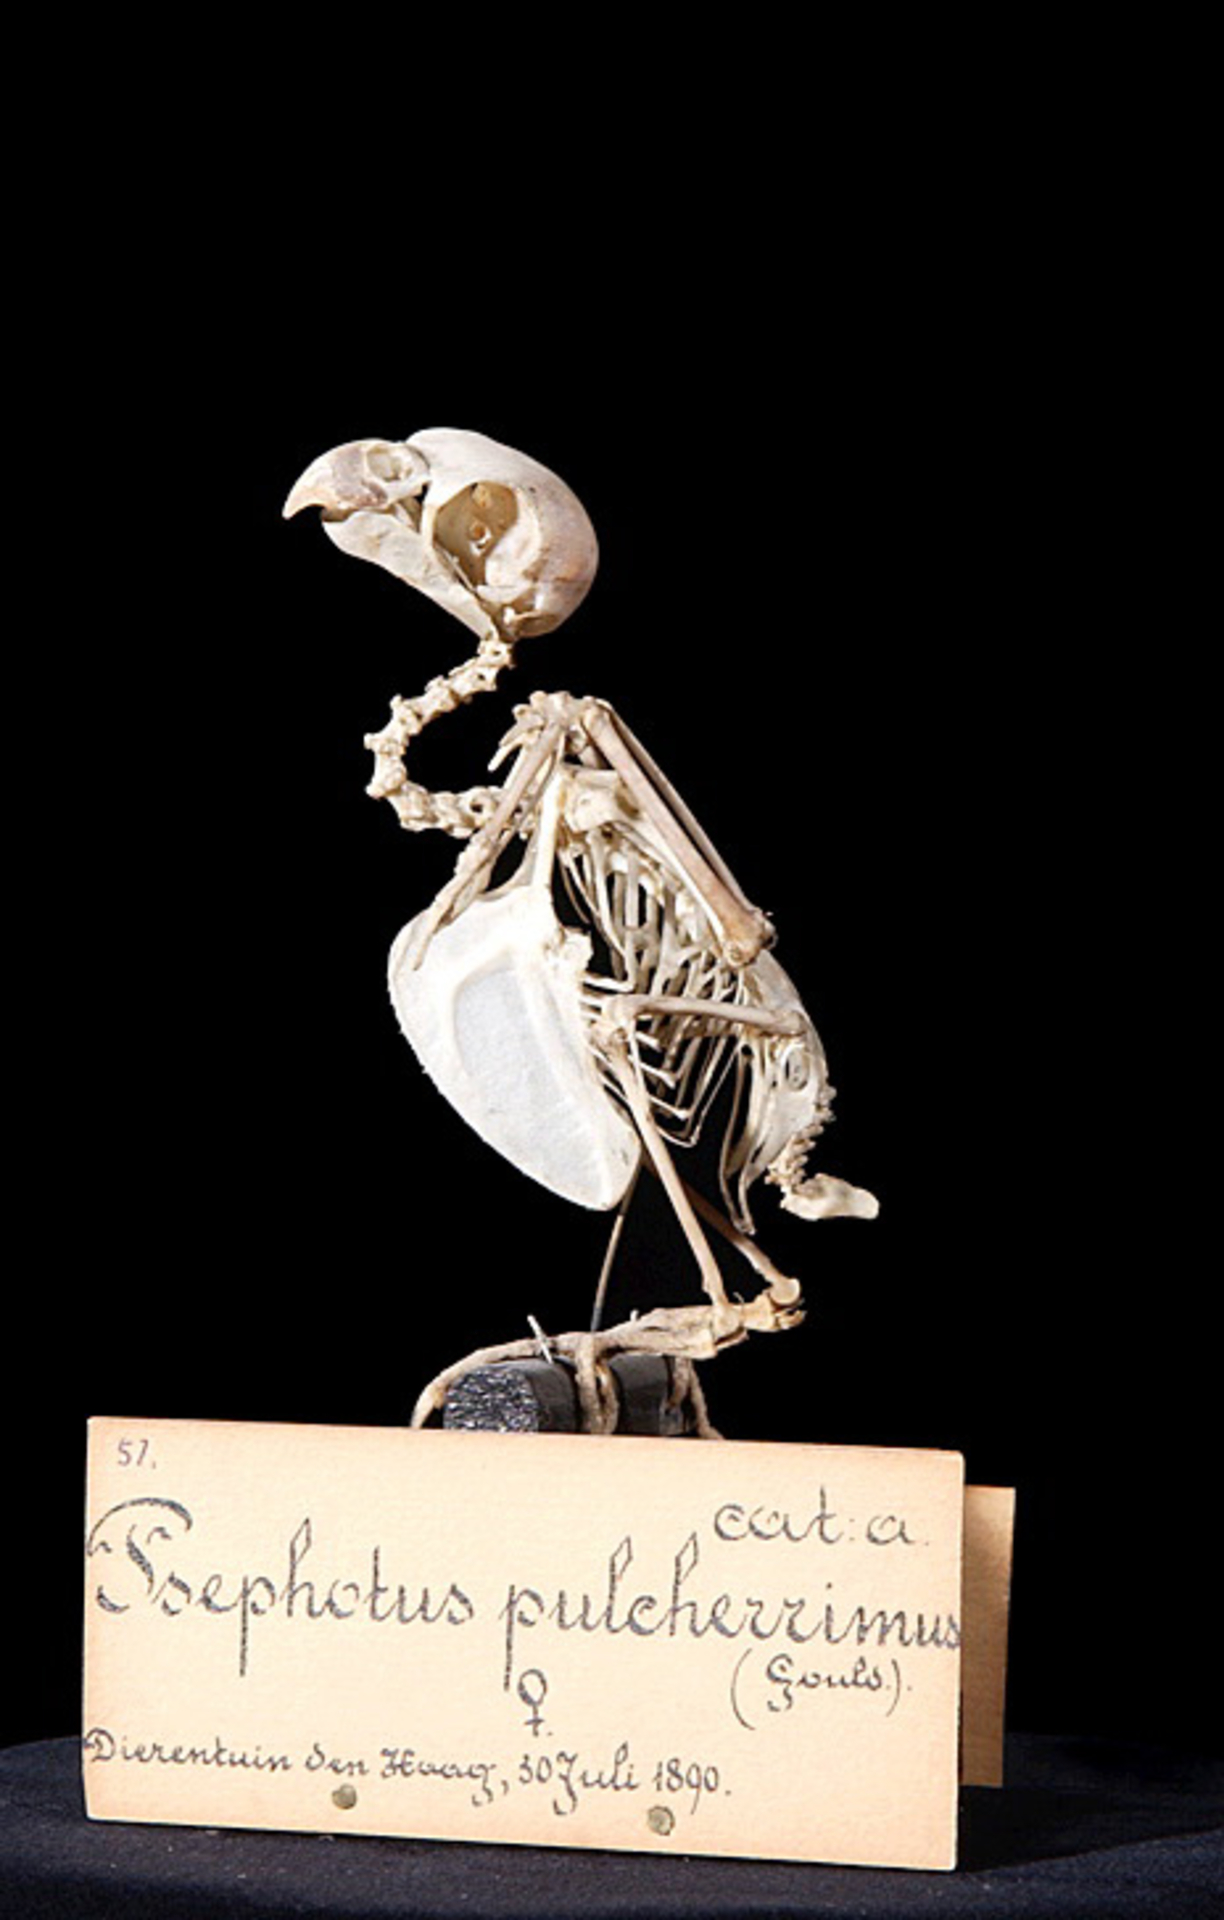 RMNH.AVES.110113   Psephotus pulcherrimus (Gould, 1845)